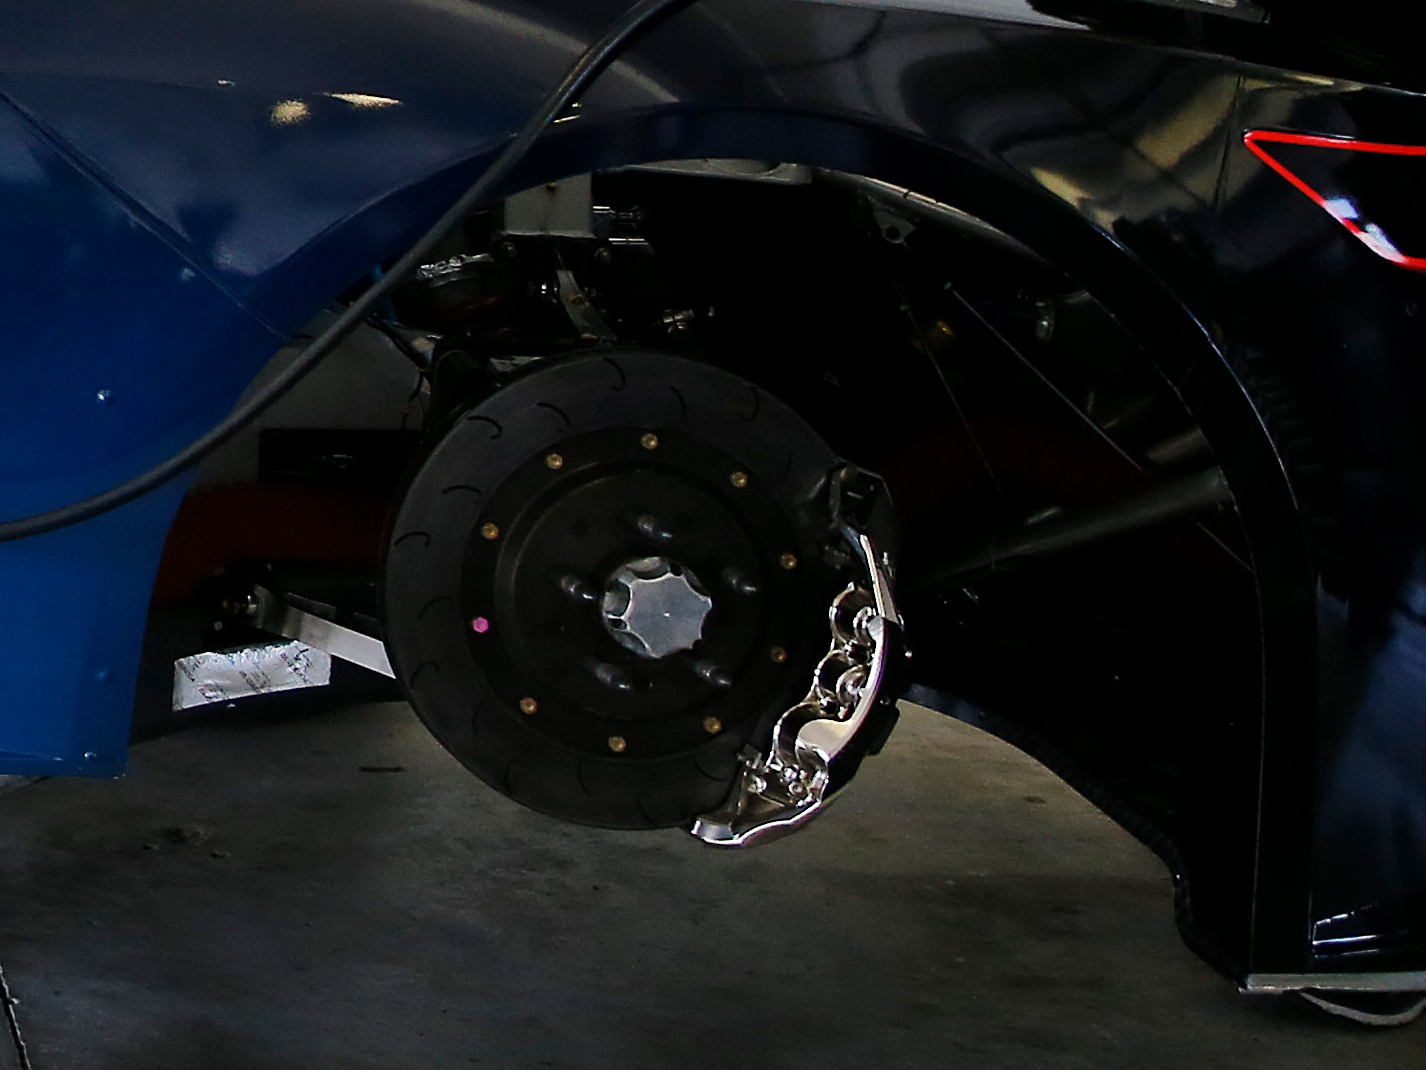 front brake and caliper close-up